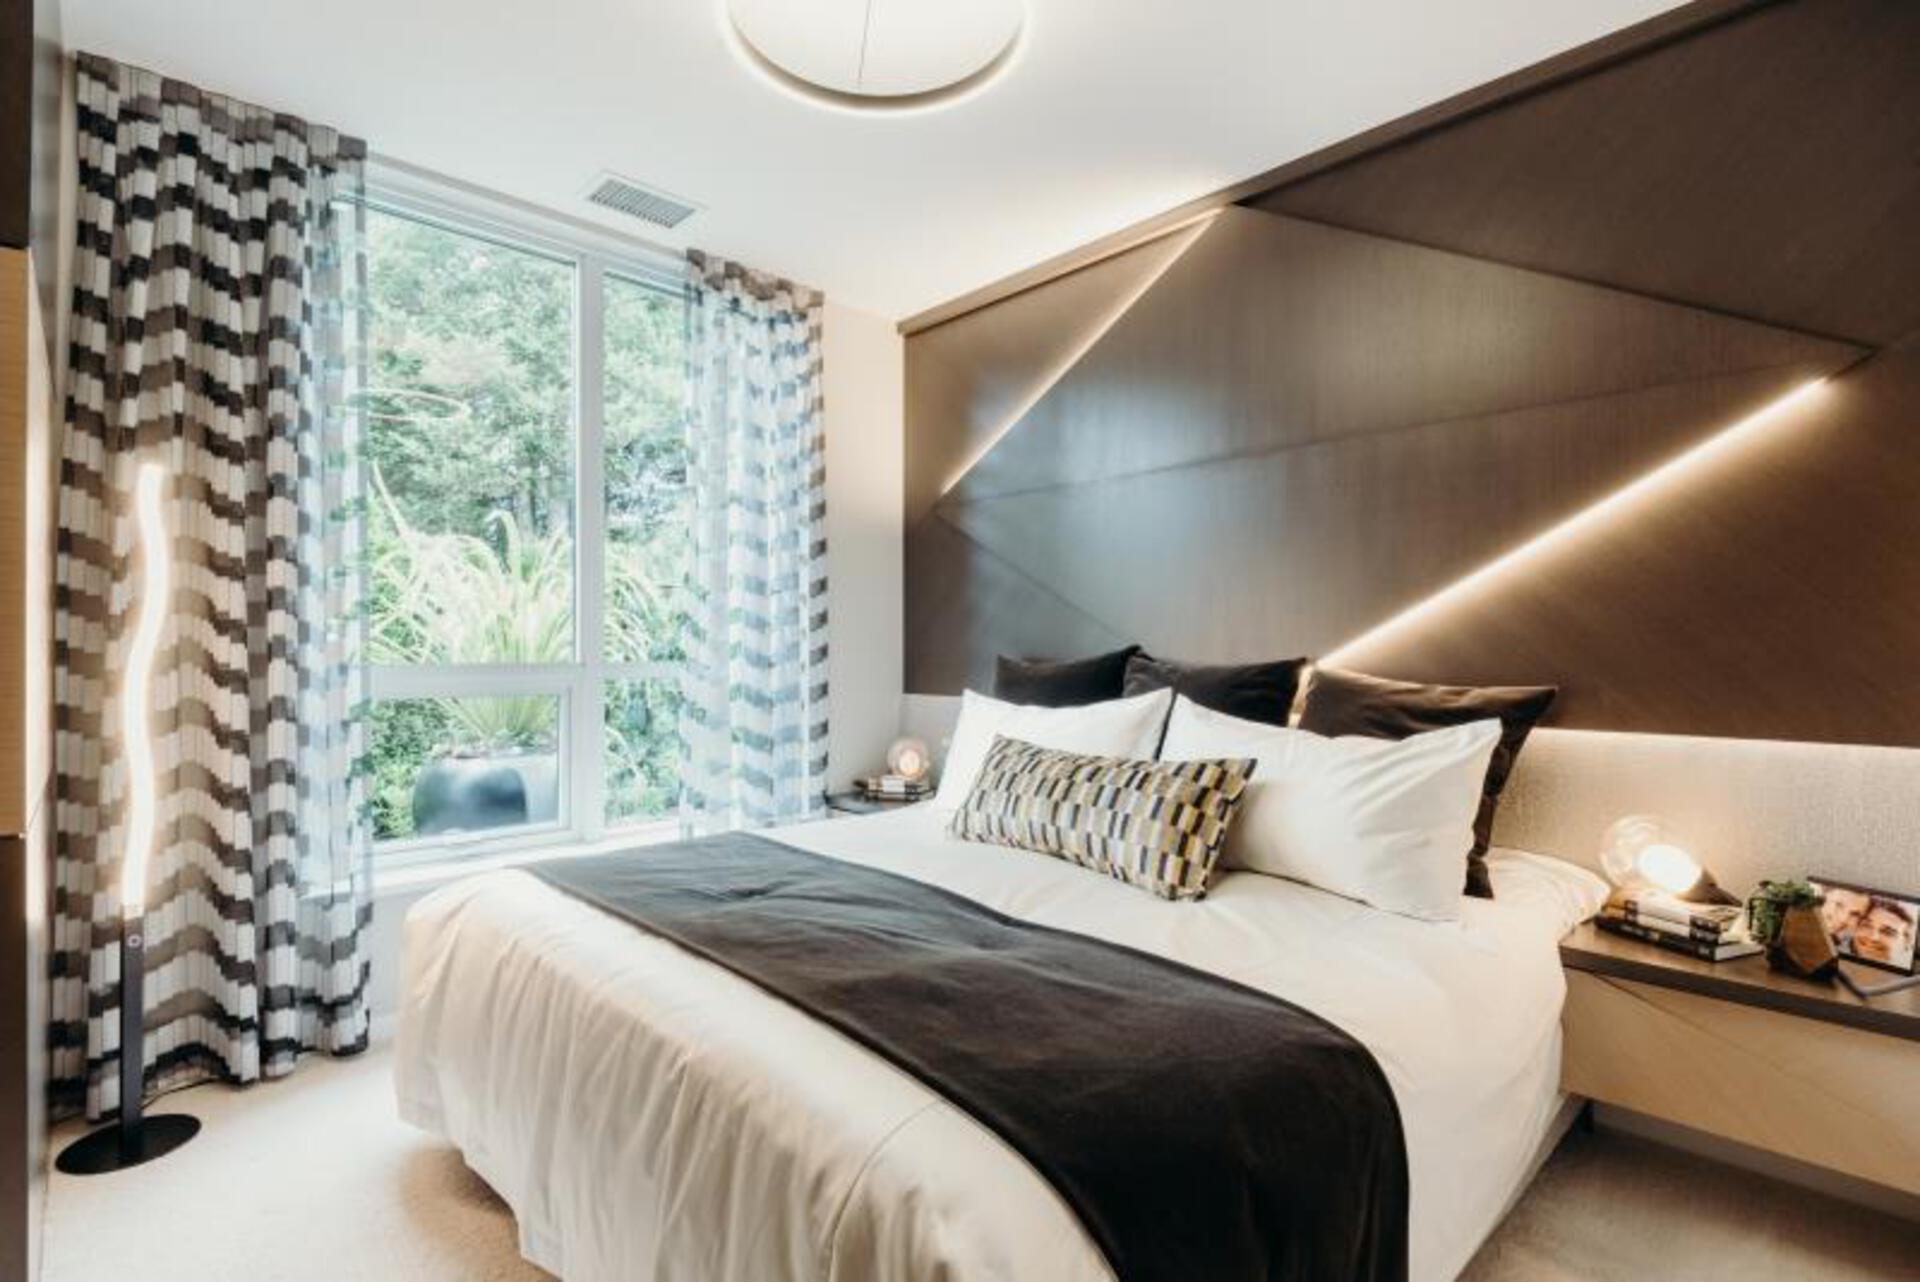 Vittorio by Polygon Bedroom at Vittorio (6700 Dunblane Avenue, Metrotown, Burnaby South)